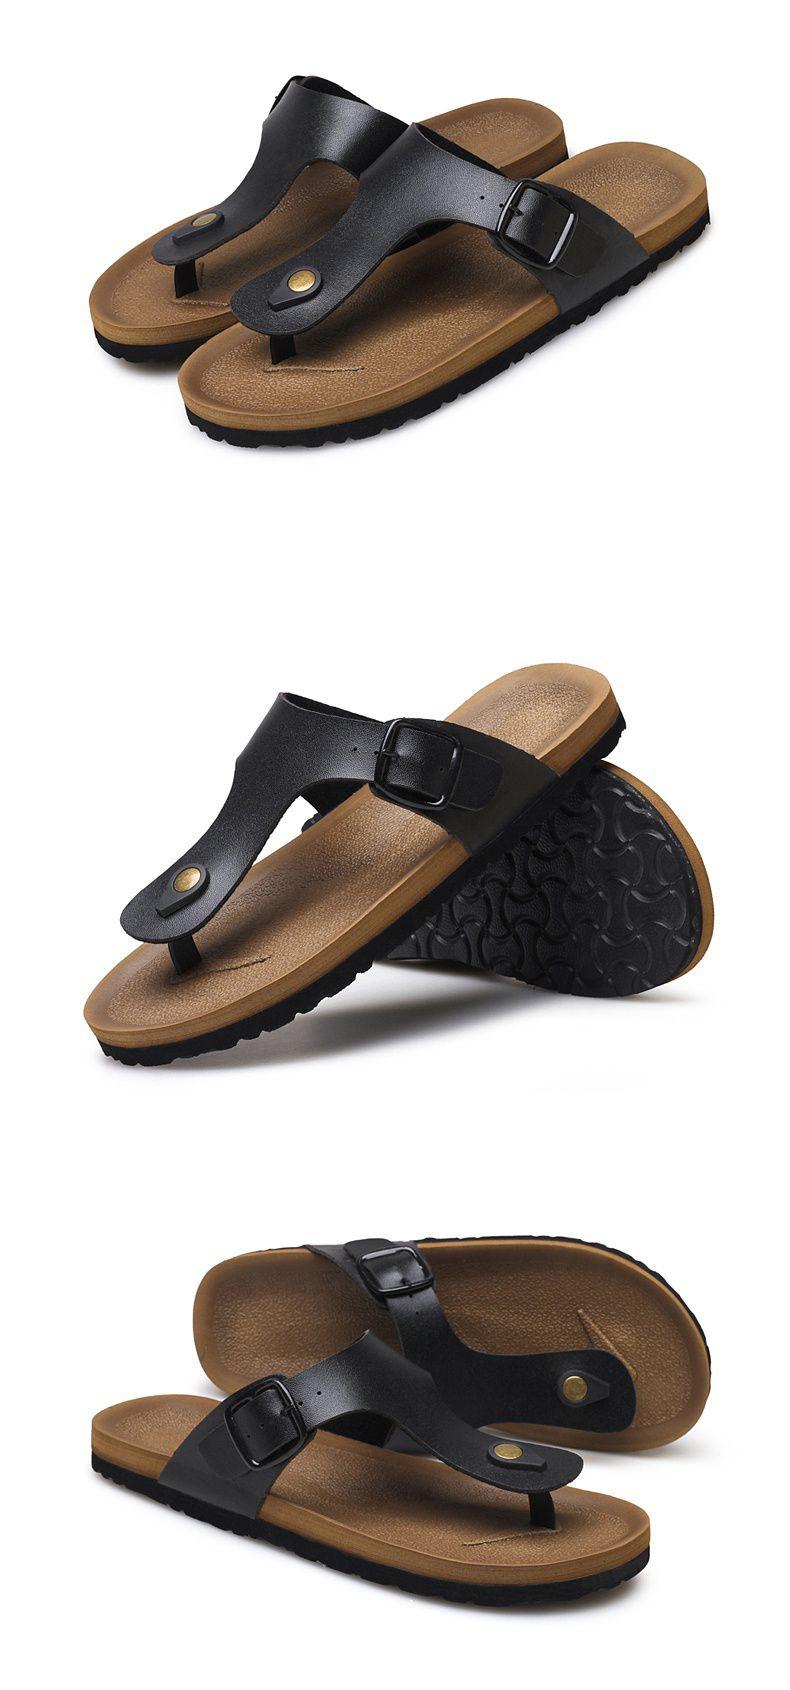 ea0d33c4309b7 ... Pu Leather Sandals Men Black Brown Flip Flops Casual Flat Sandals  Summer Beach Slipper Men Comfort